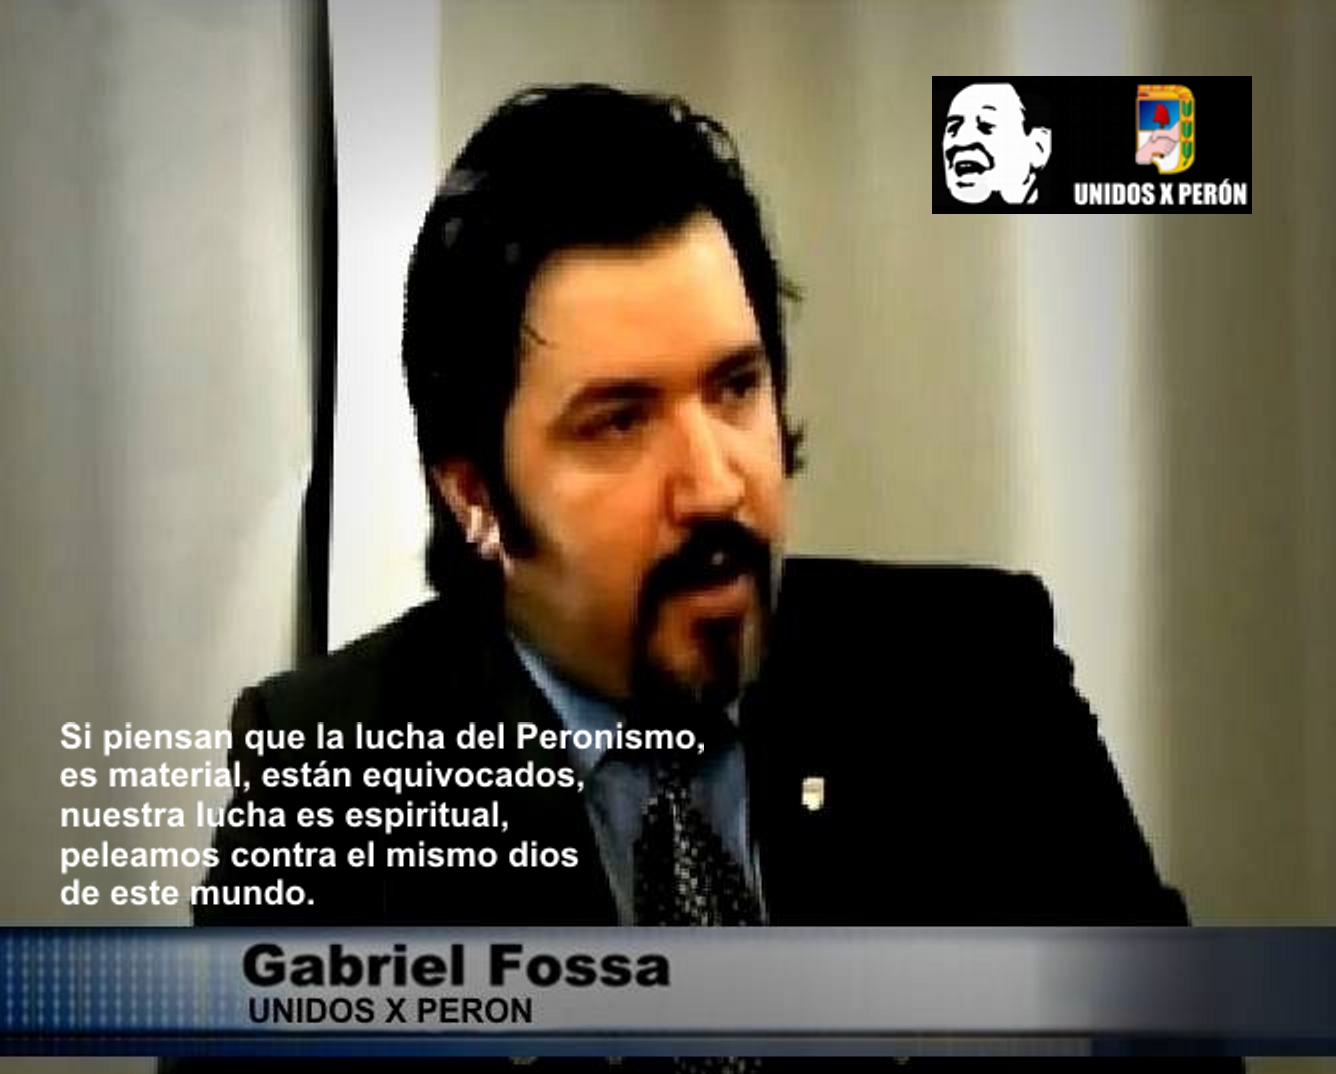 Gabriel Fossa